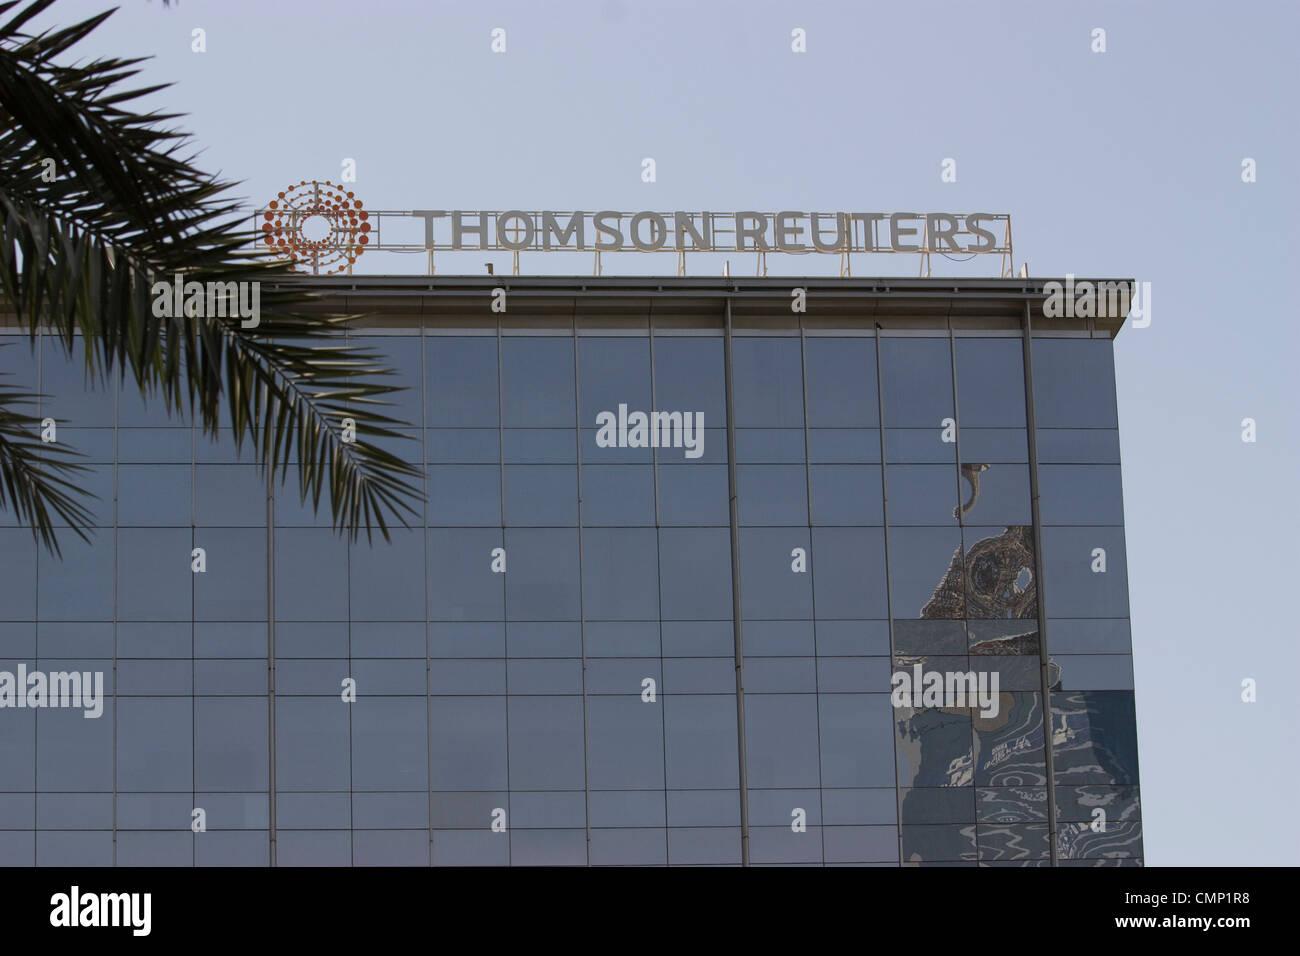 UAE Vereinigte Arabische Emirate Dubai Thomson Reuters Dubai Media City Stockfoto